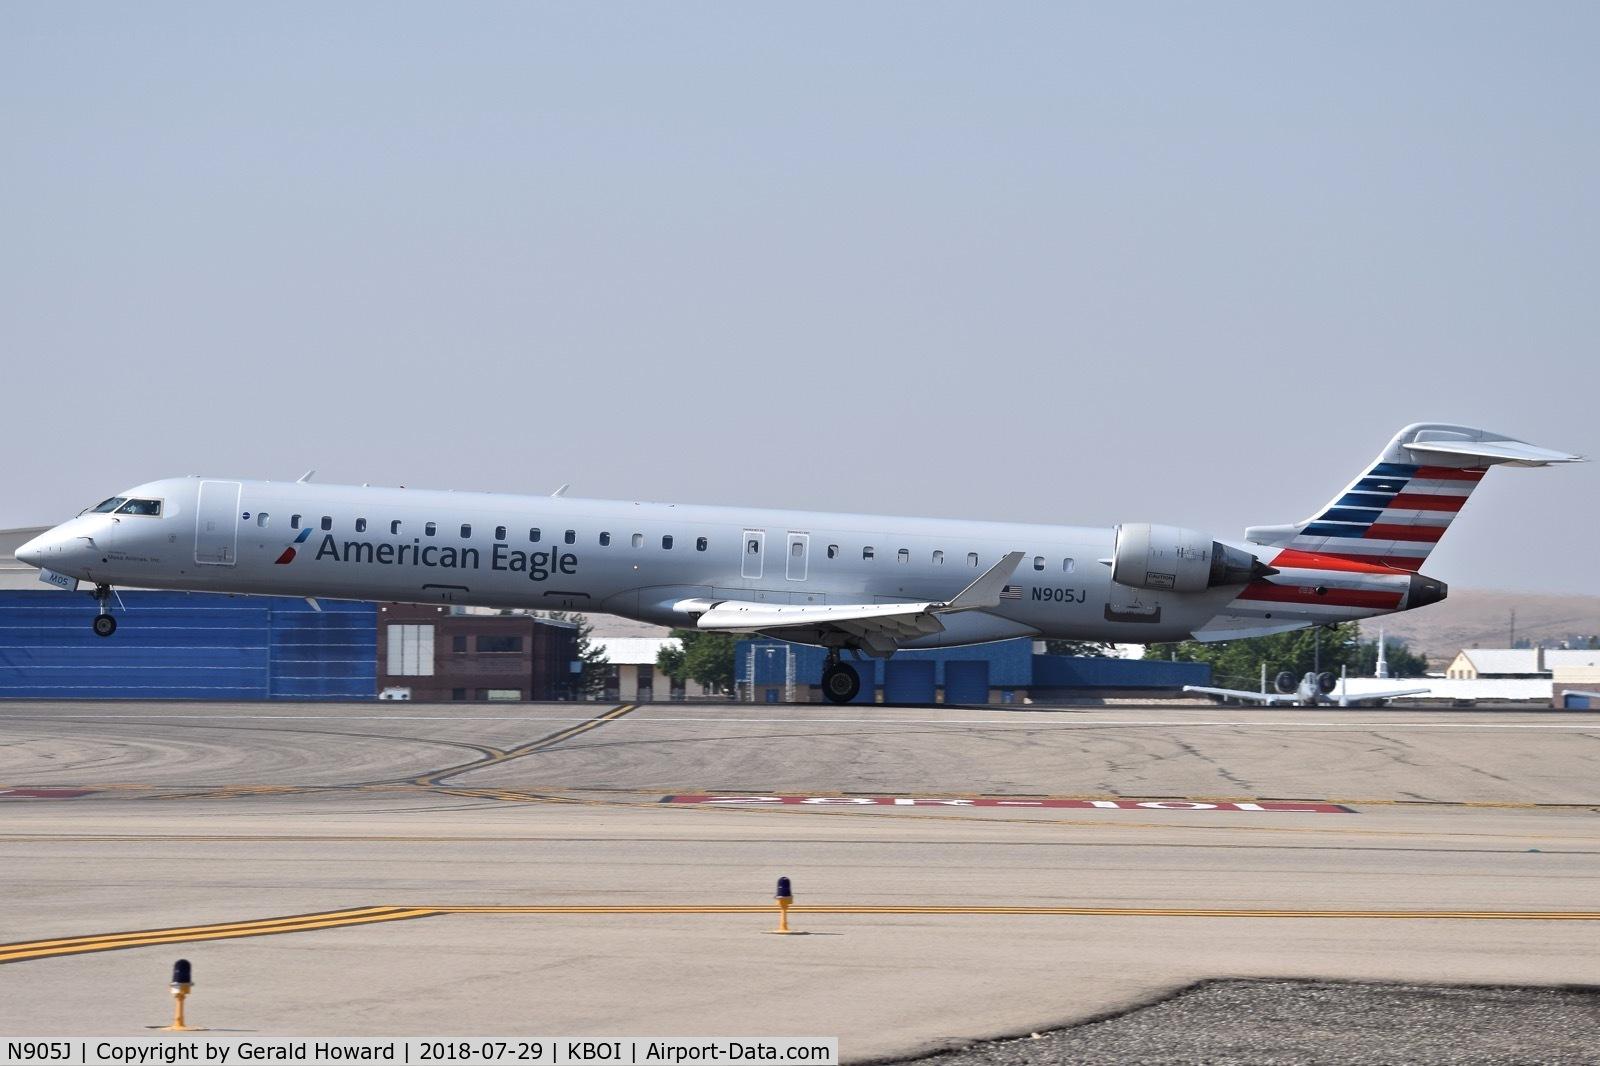 N905J, 2003 Bombardier CRJ-900 (CL-600-2D24) C/N 15005, Landing RWY 10L.